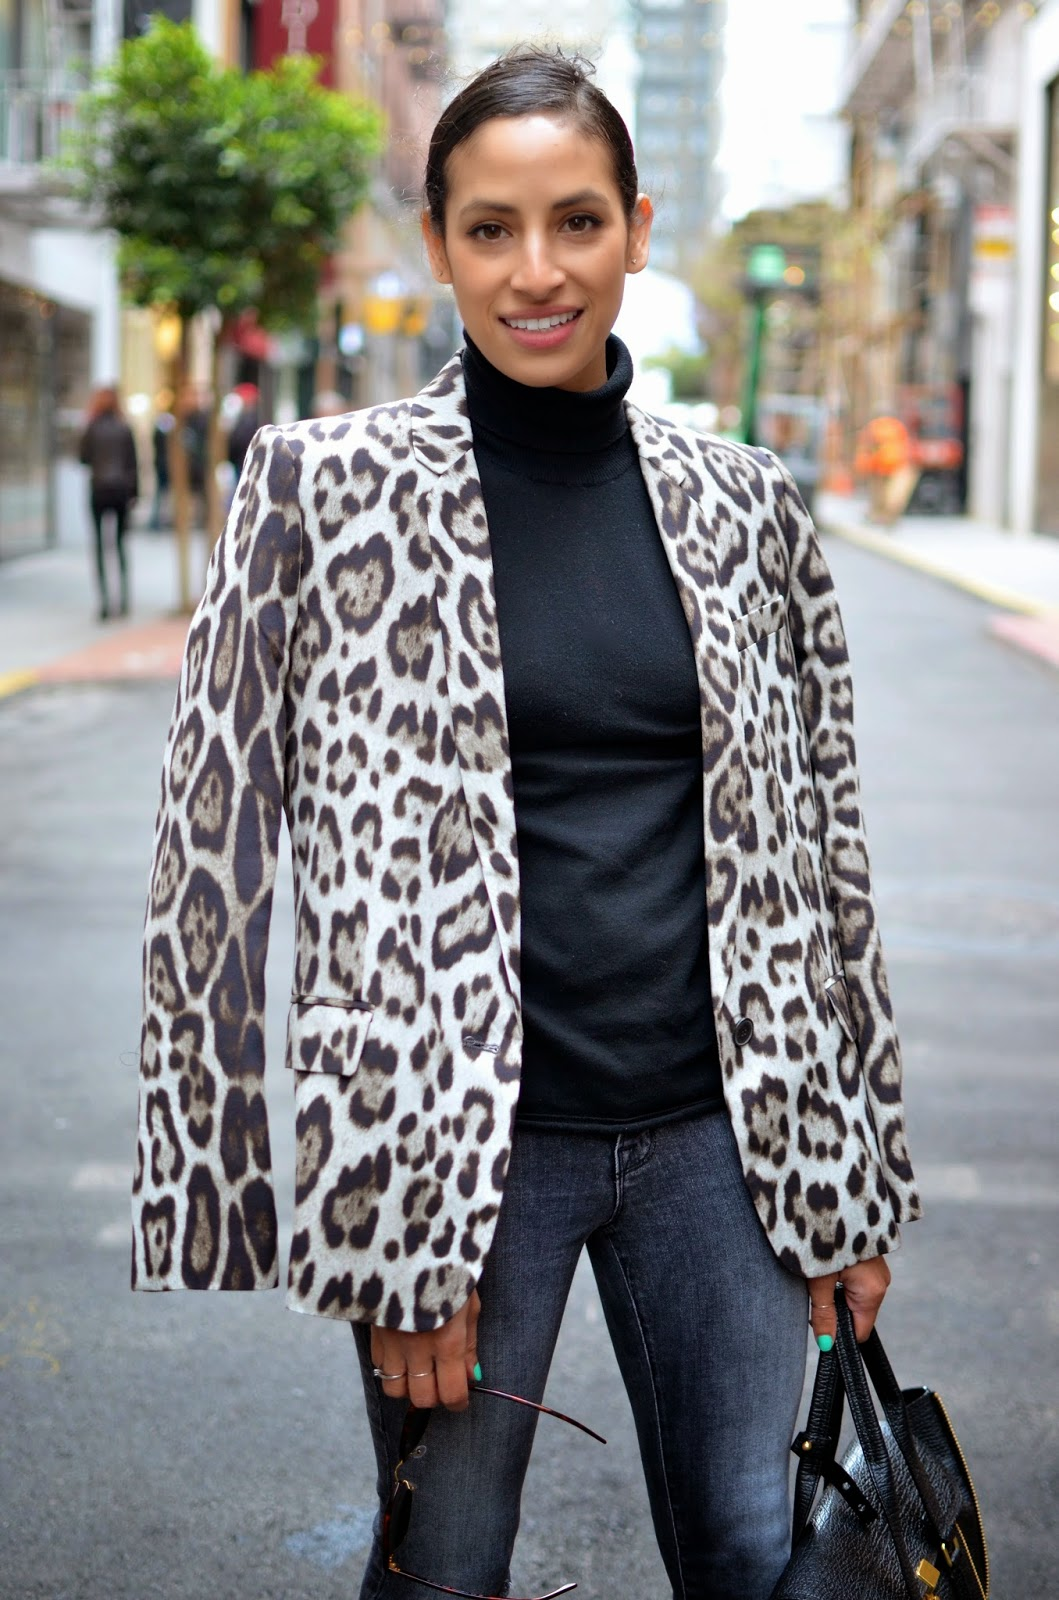 leopard print blazer, black turtleneck, SF street style, SF style blogger, SF fashion blogger, Maiden Lane, grey distressed denim, J. Brand denim, Jean Michel Cazabat heels, 3.1 Phillip Lim Pashli